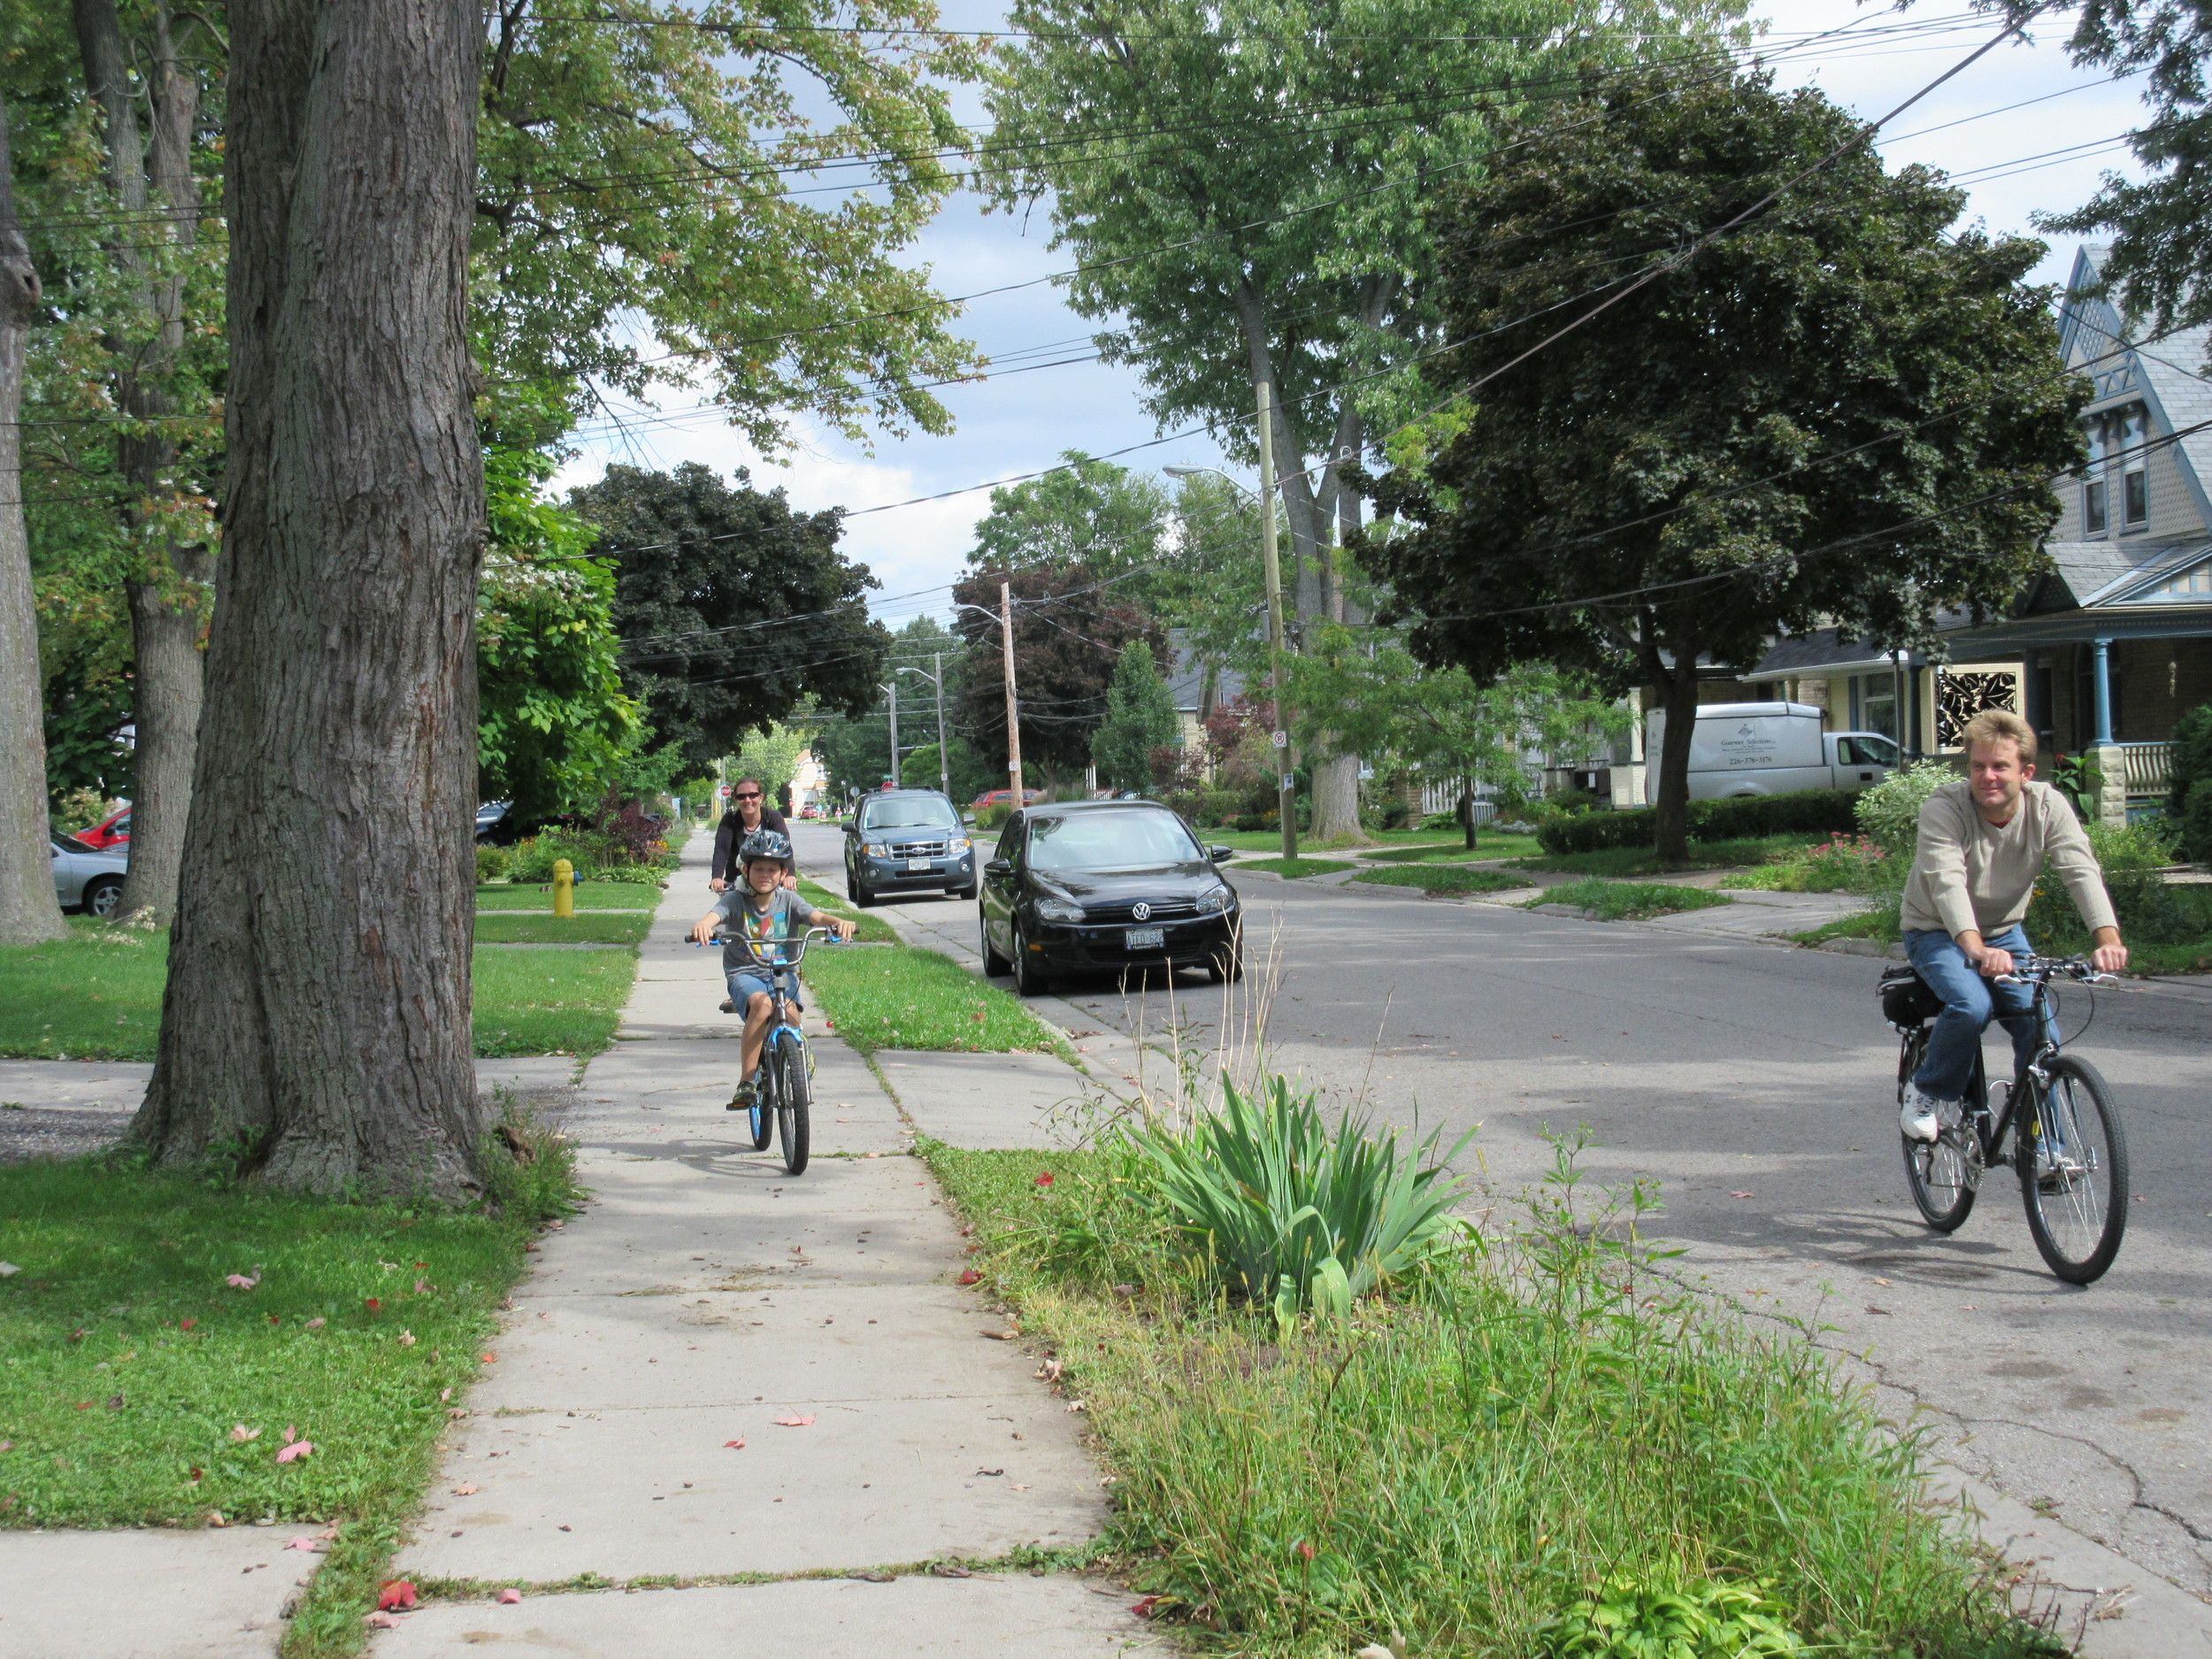 """It's fun to bike around here. Biking is one of my favourite things to do. My neighbourhood is very pretty."""